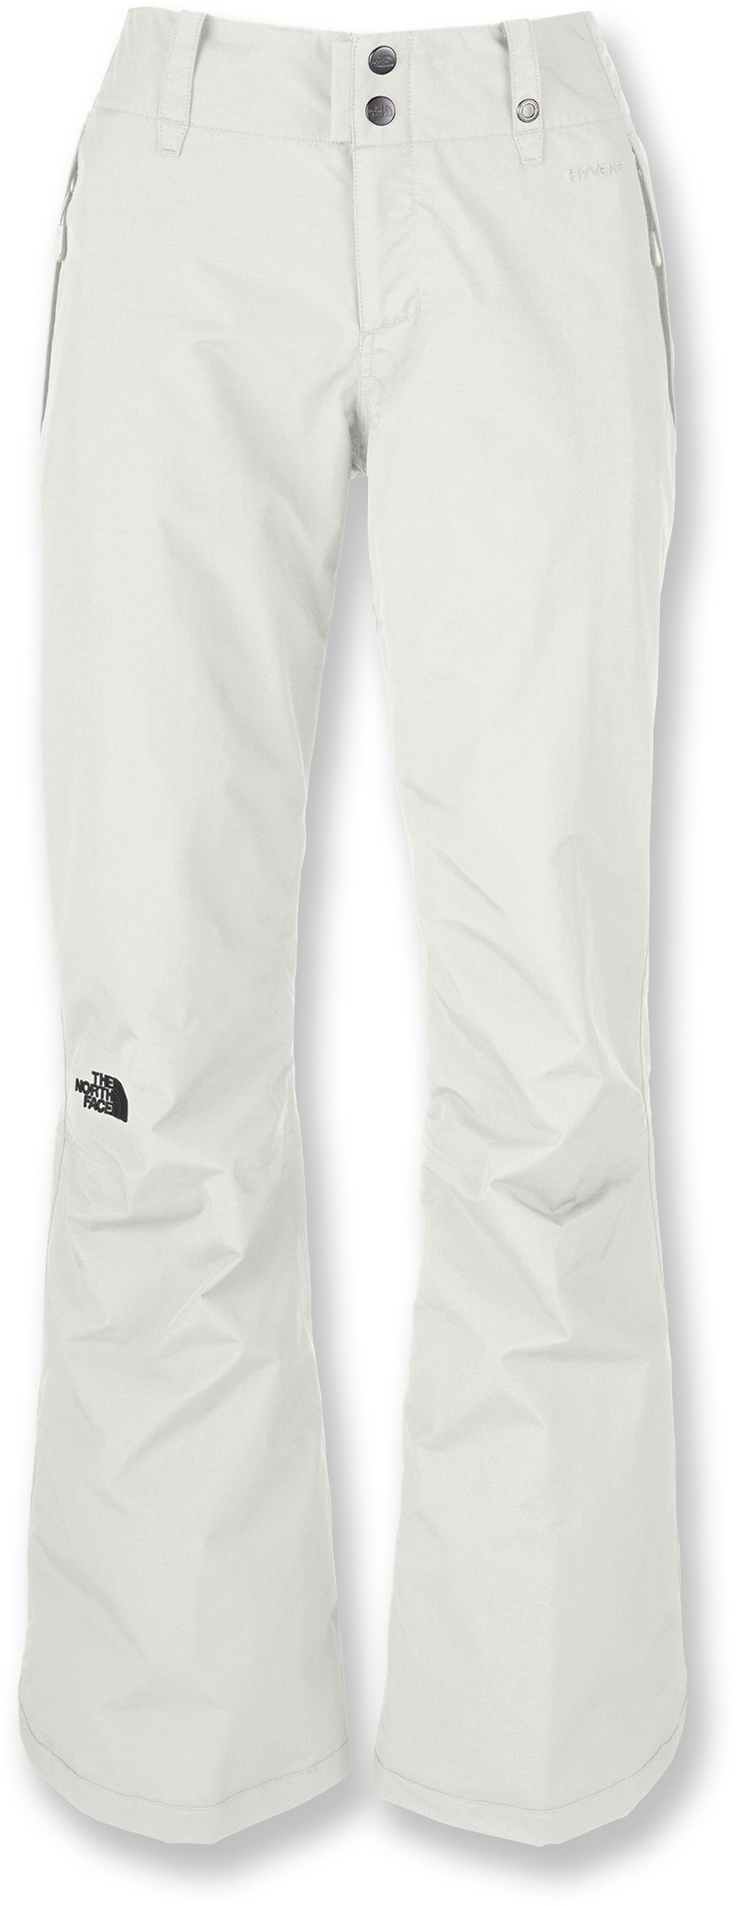 Ski Pants! $69.93